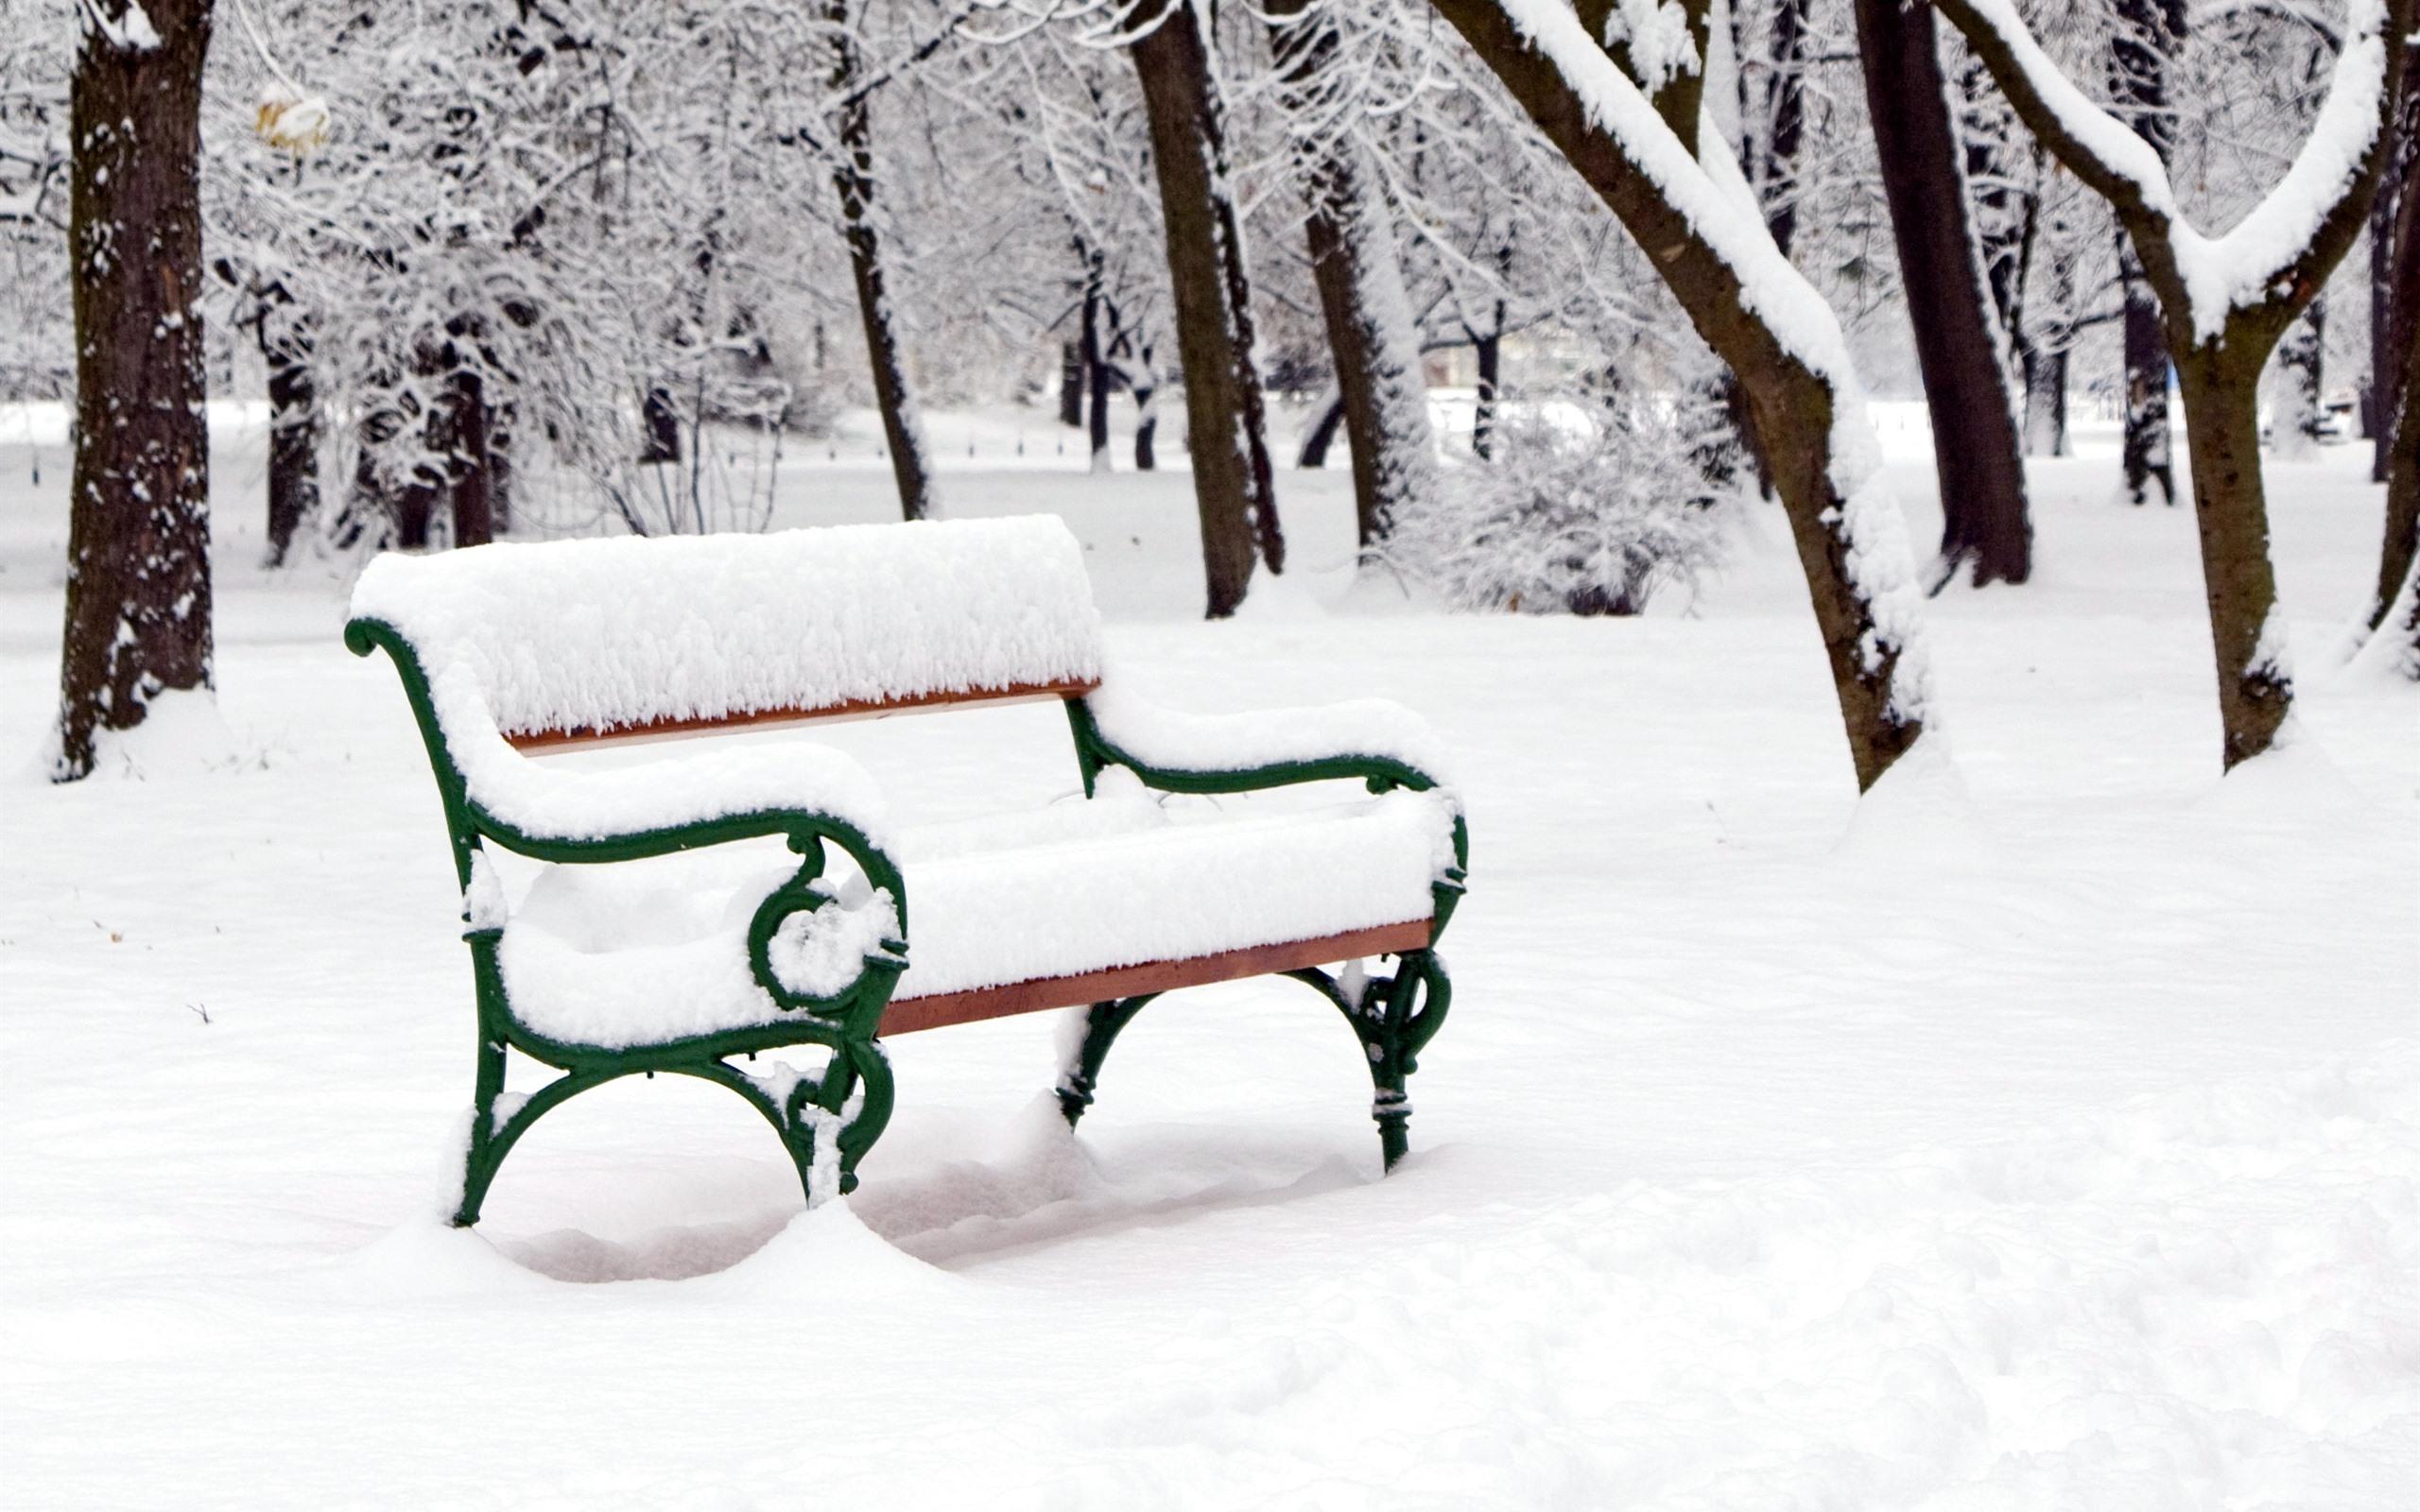 скамейка под снегом картинки каждого